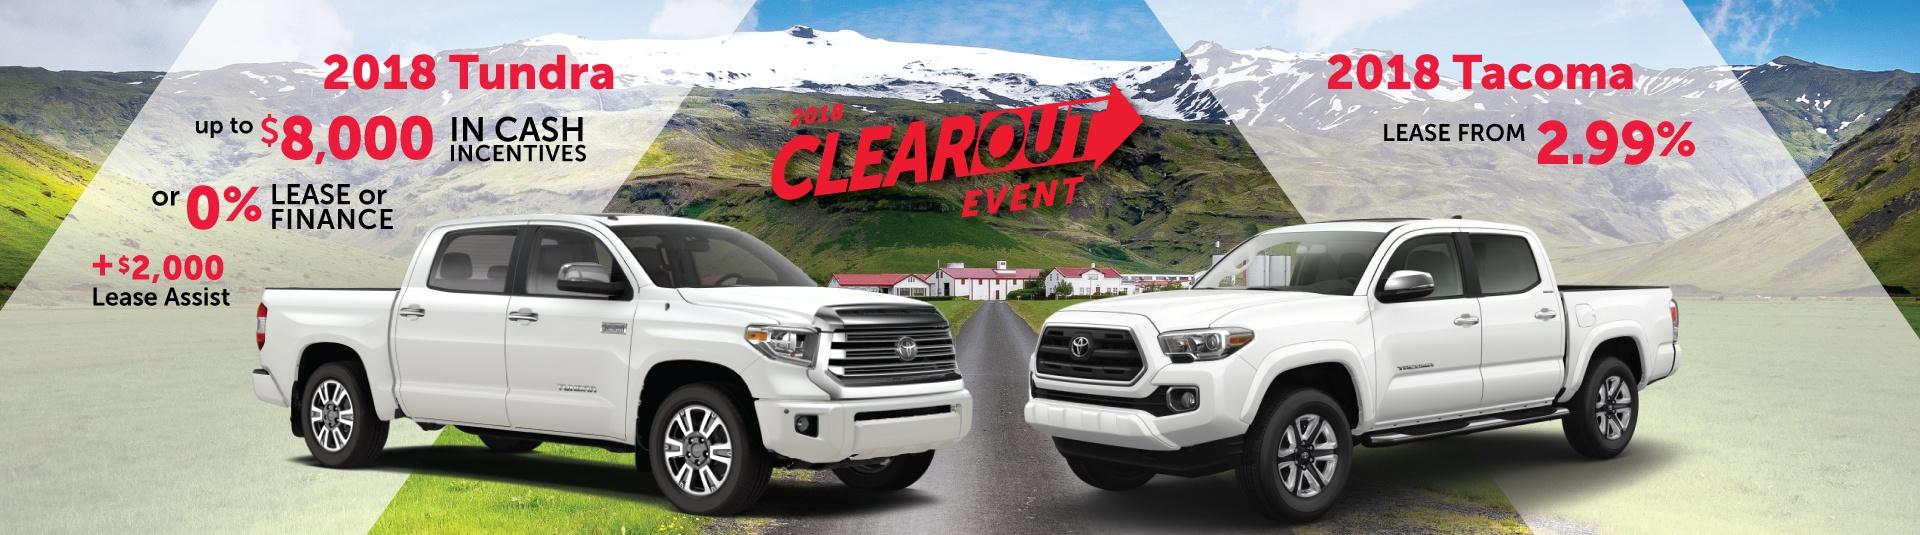 2018 Toyota Tundra & Tacoma Offers